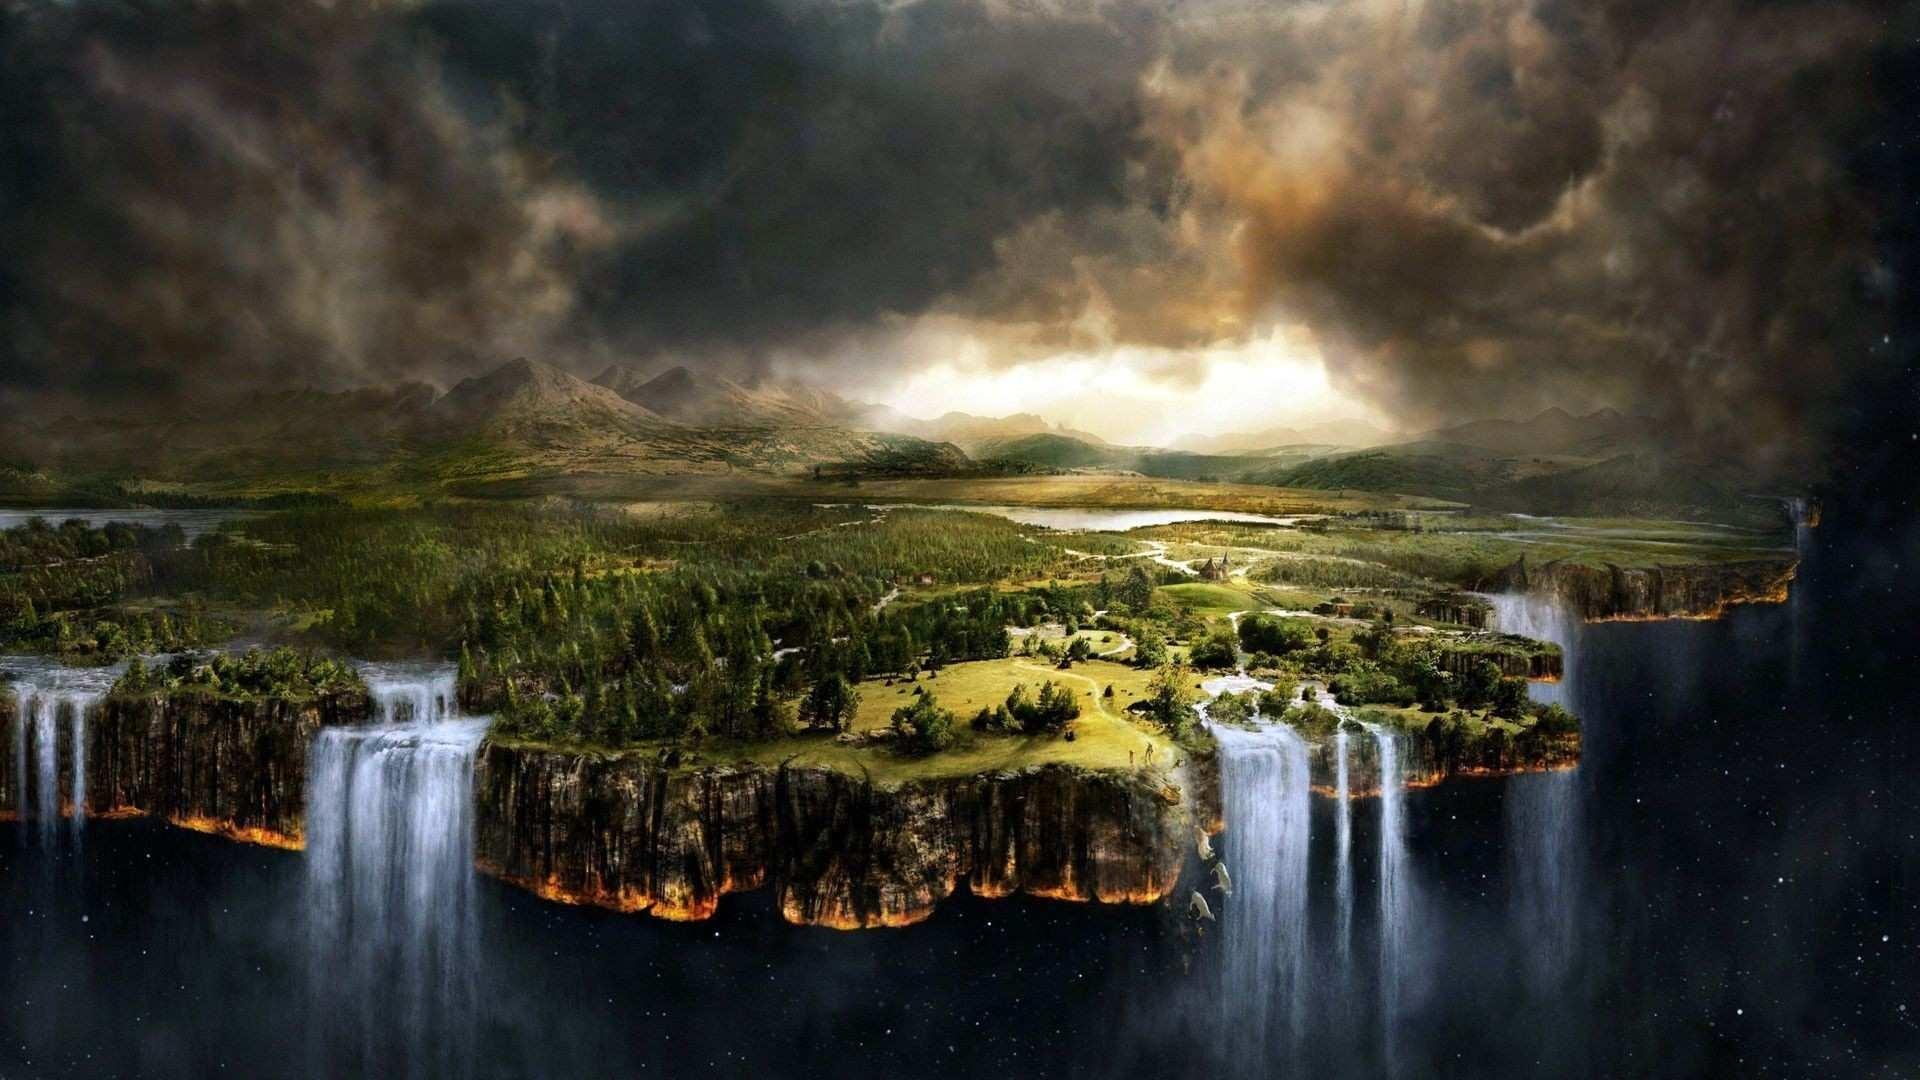 Fantasy waterfalls wallpaper